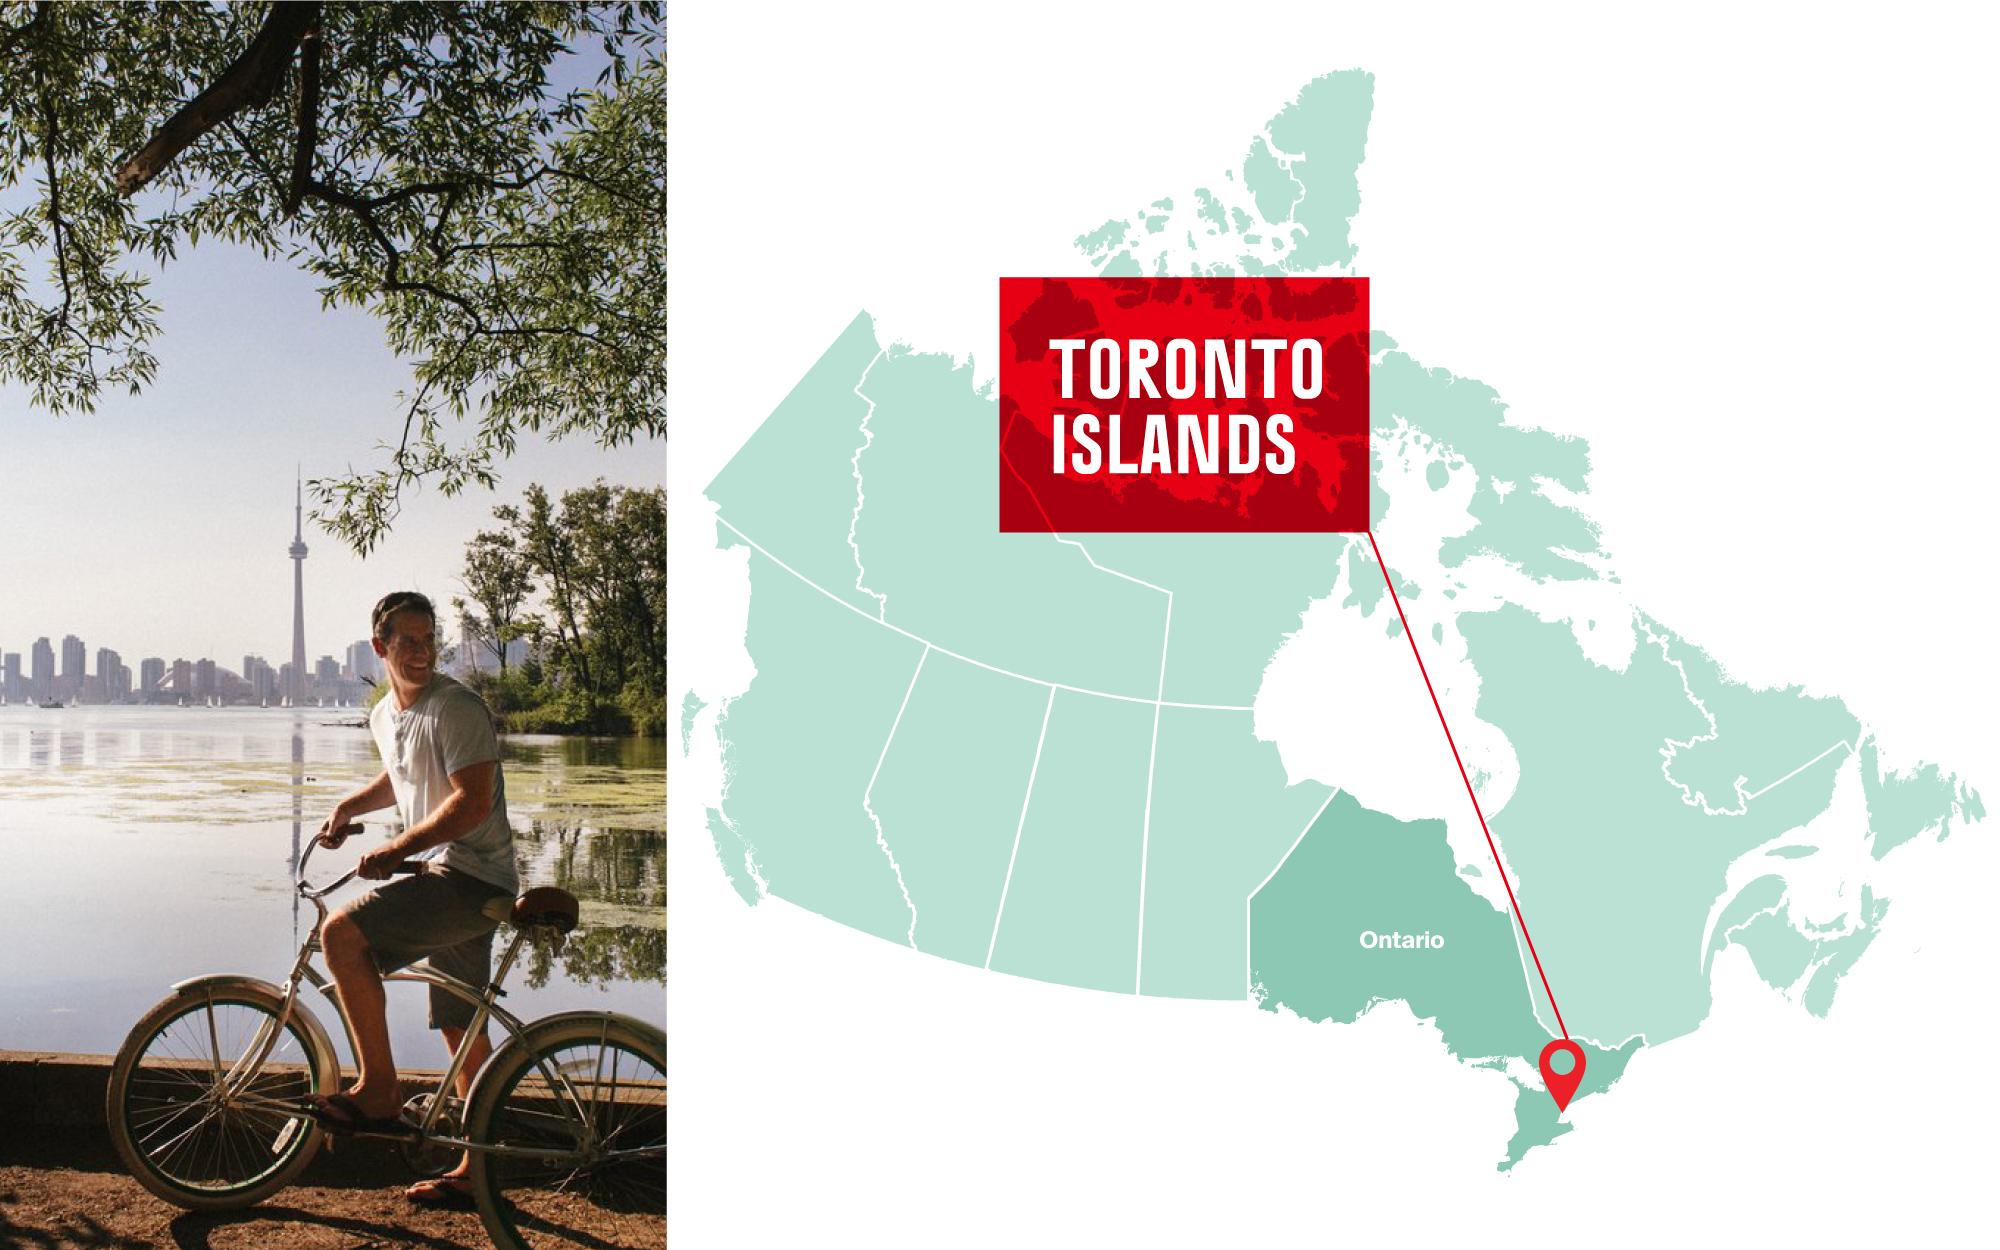 Biking along the Toronto Islands